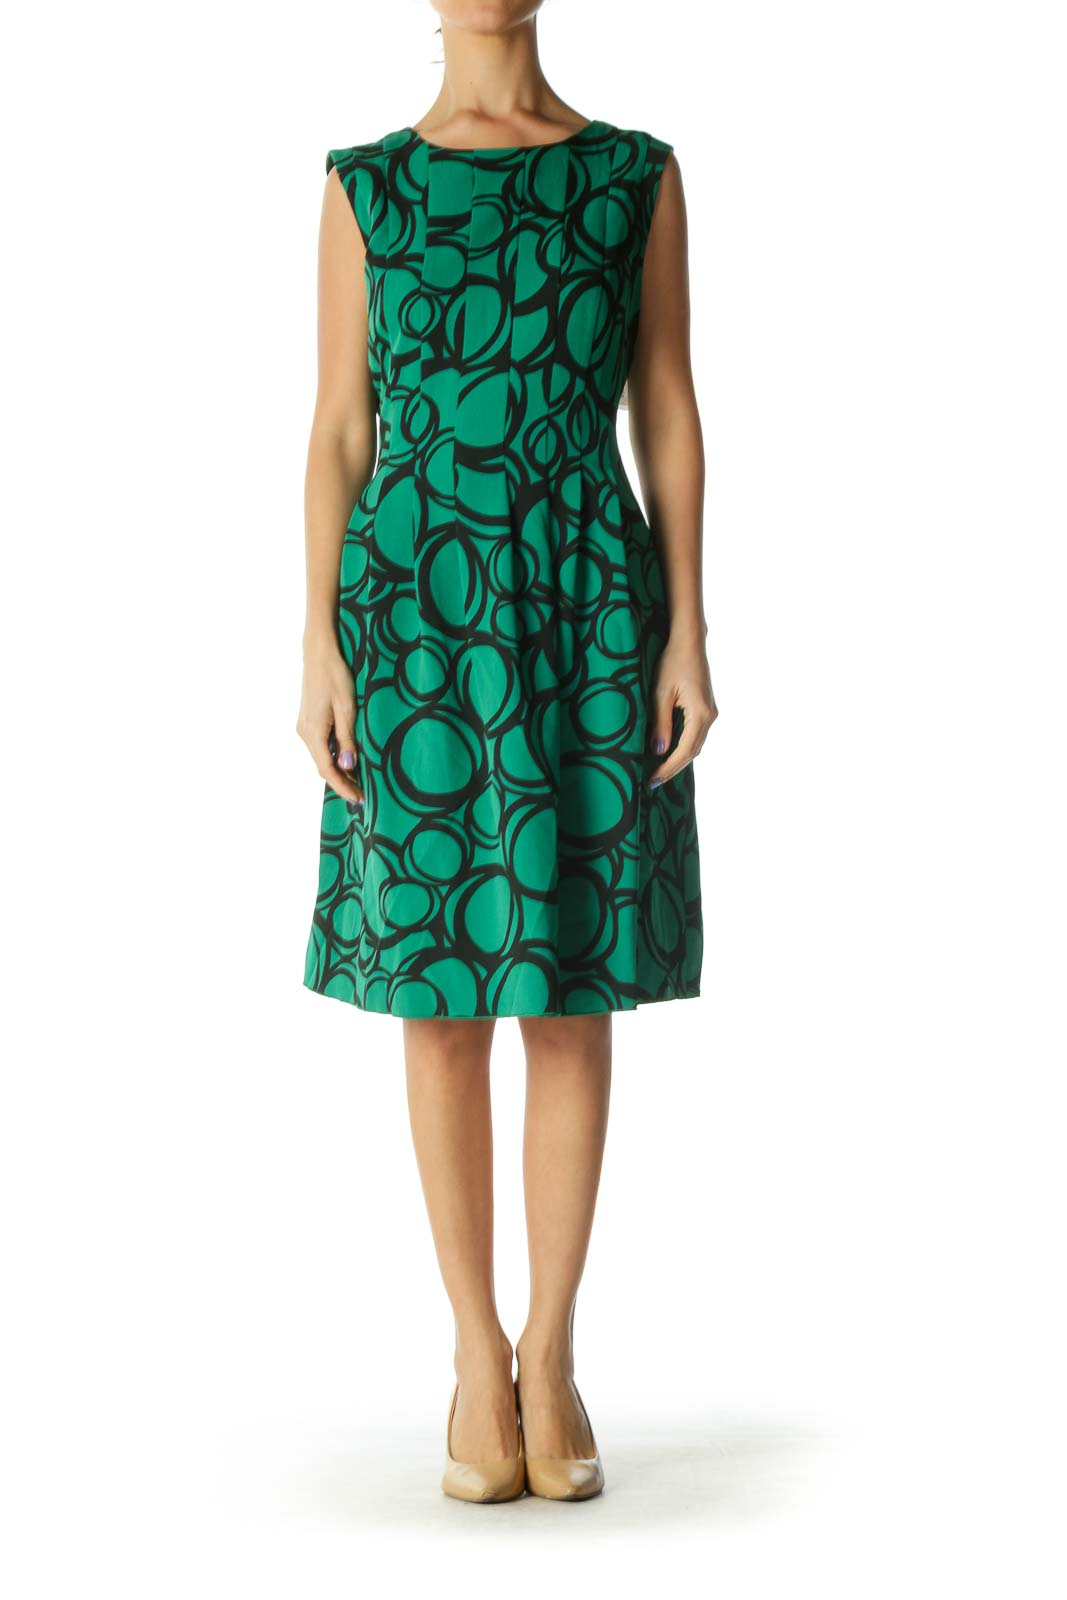 Green Black Pleated Sleeveless Dress